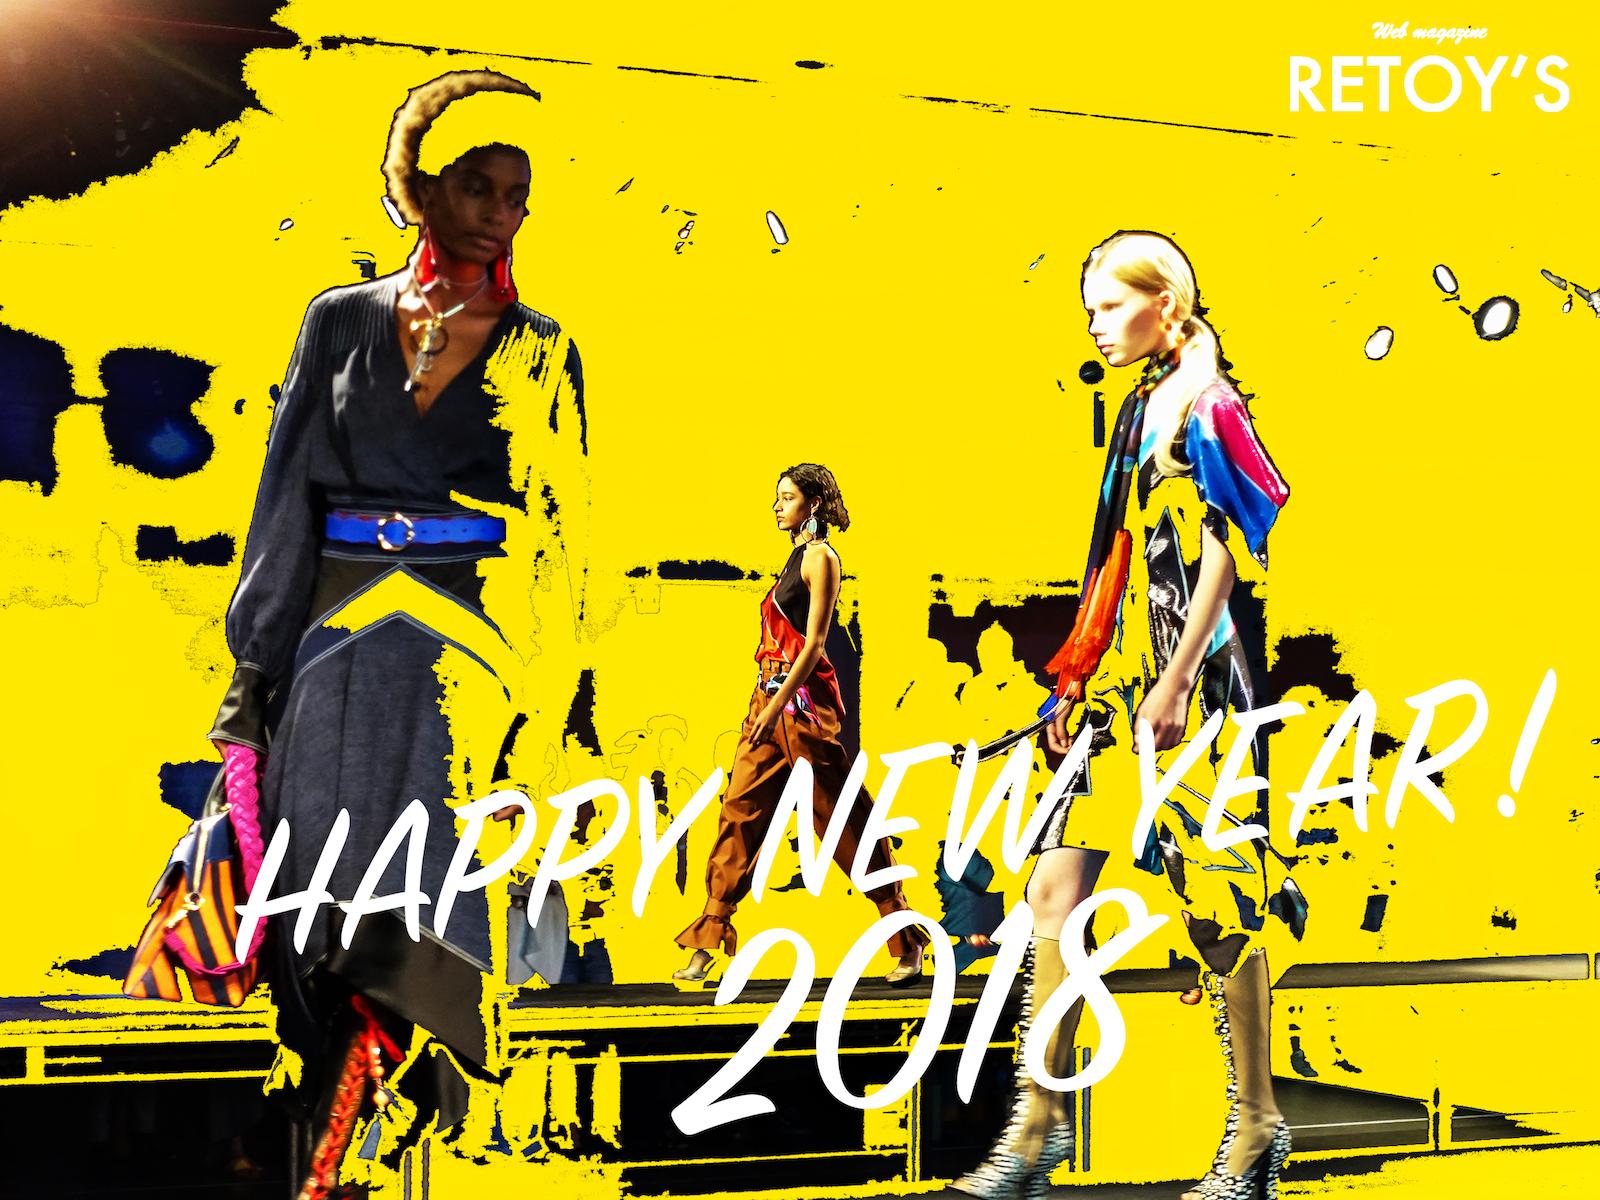 RETOY'S-New Year 2018